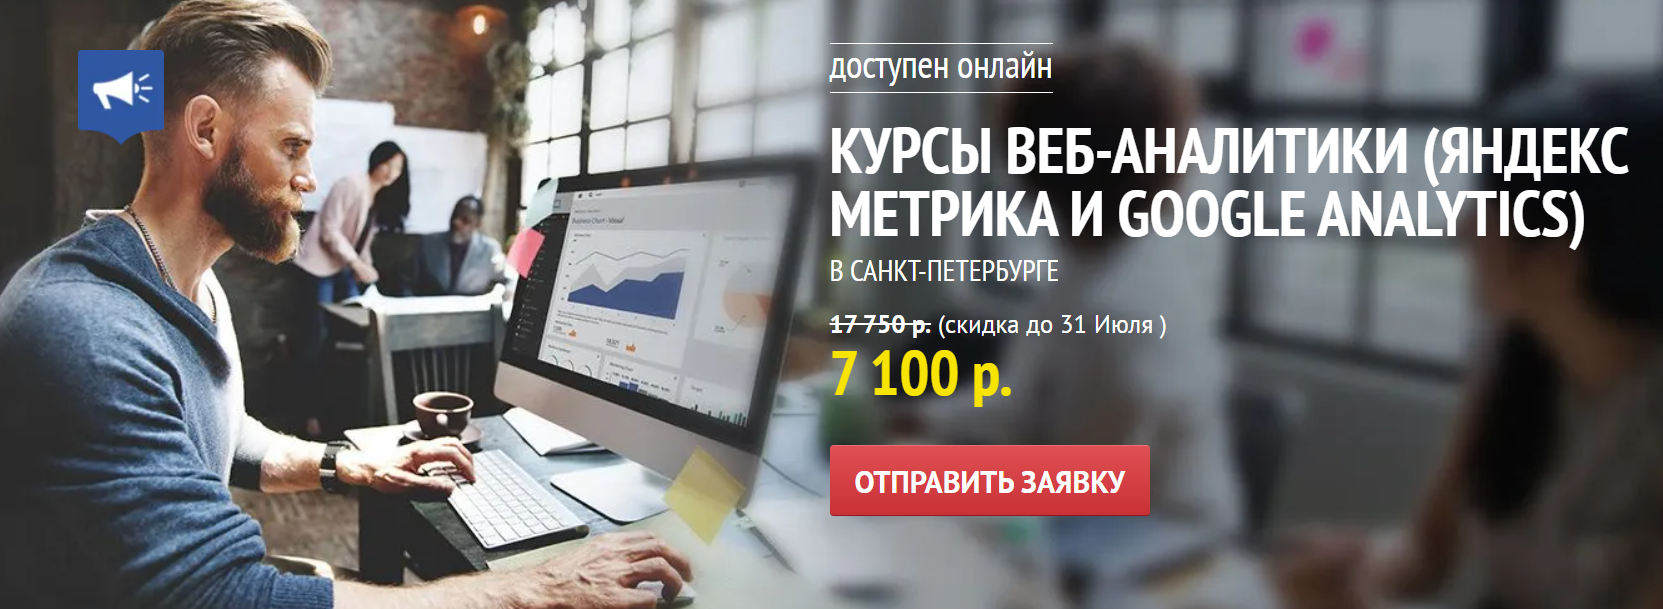 Отзывы о курсе - Веб-аналитика (Яндекс-метрика, Google Analytics) от Международной школы профессий